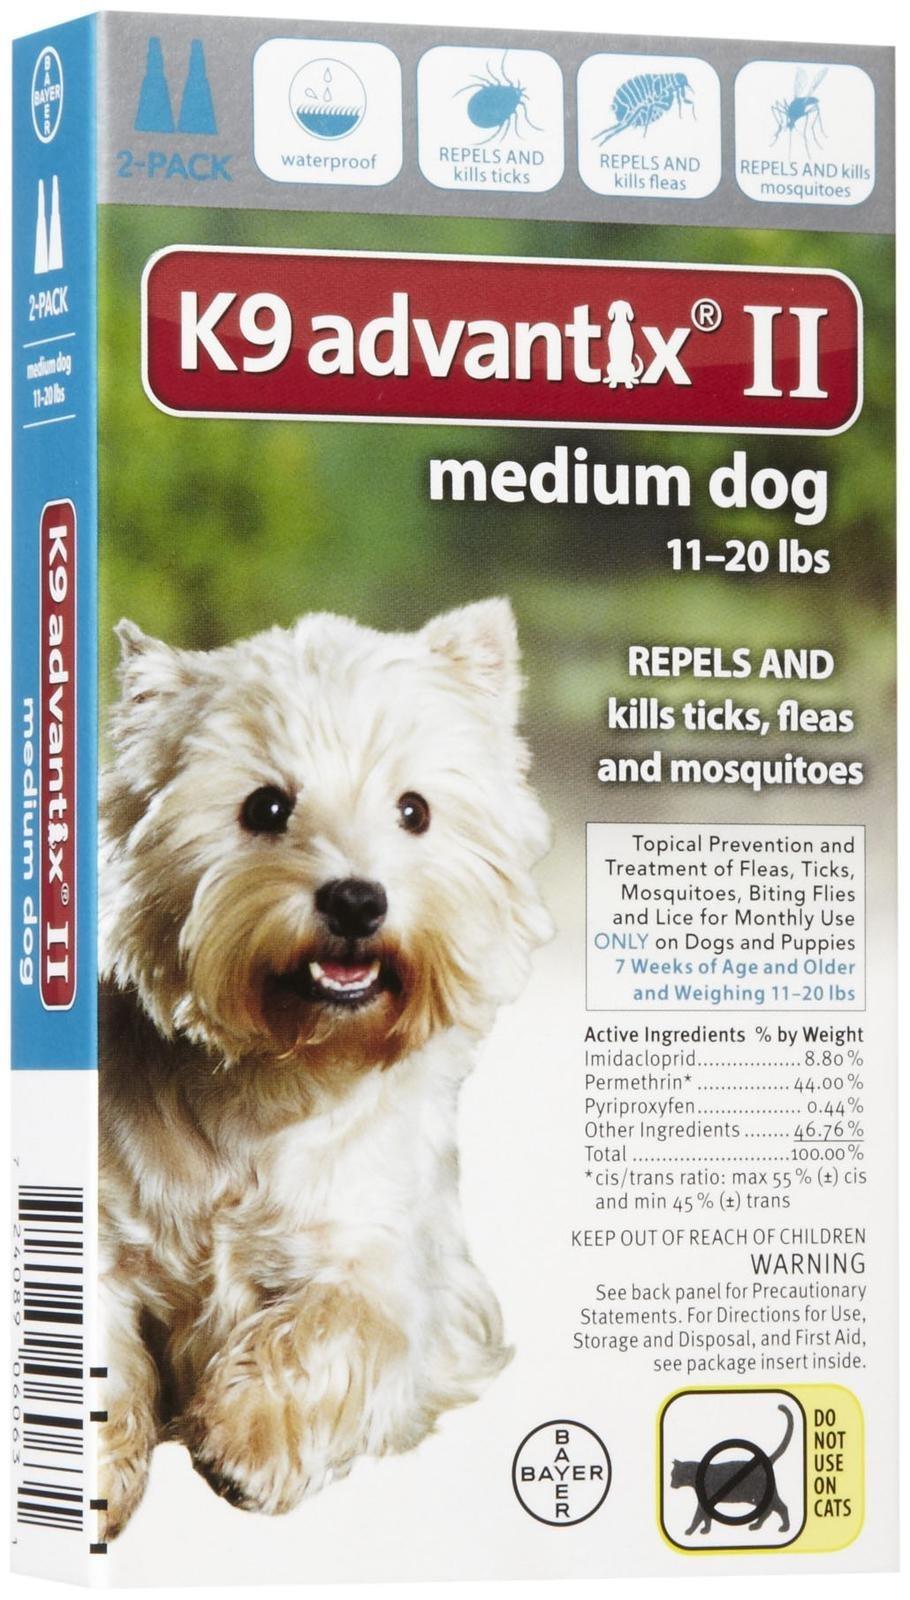 Bayer Animal Health K9 Advantix Ii Medium Dog 2-Pack